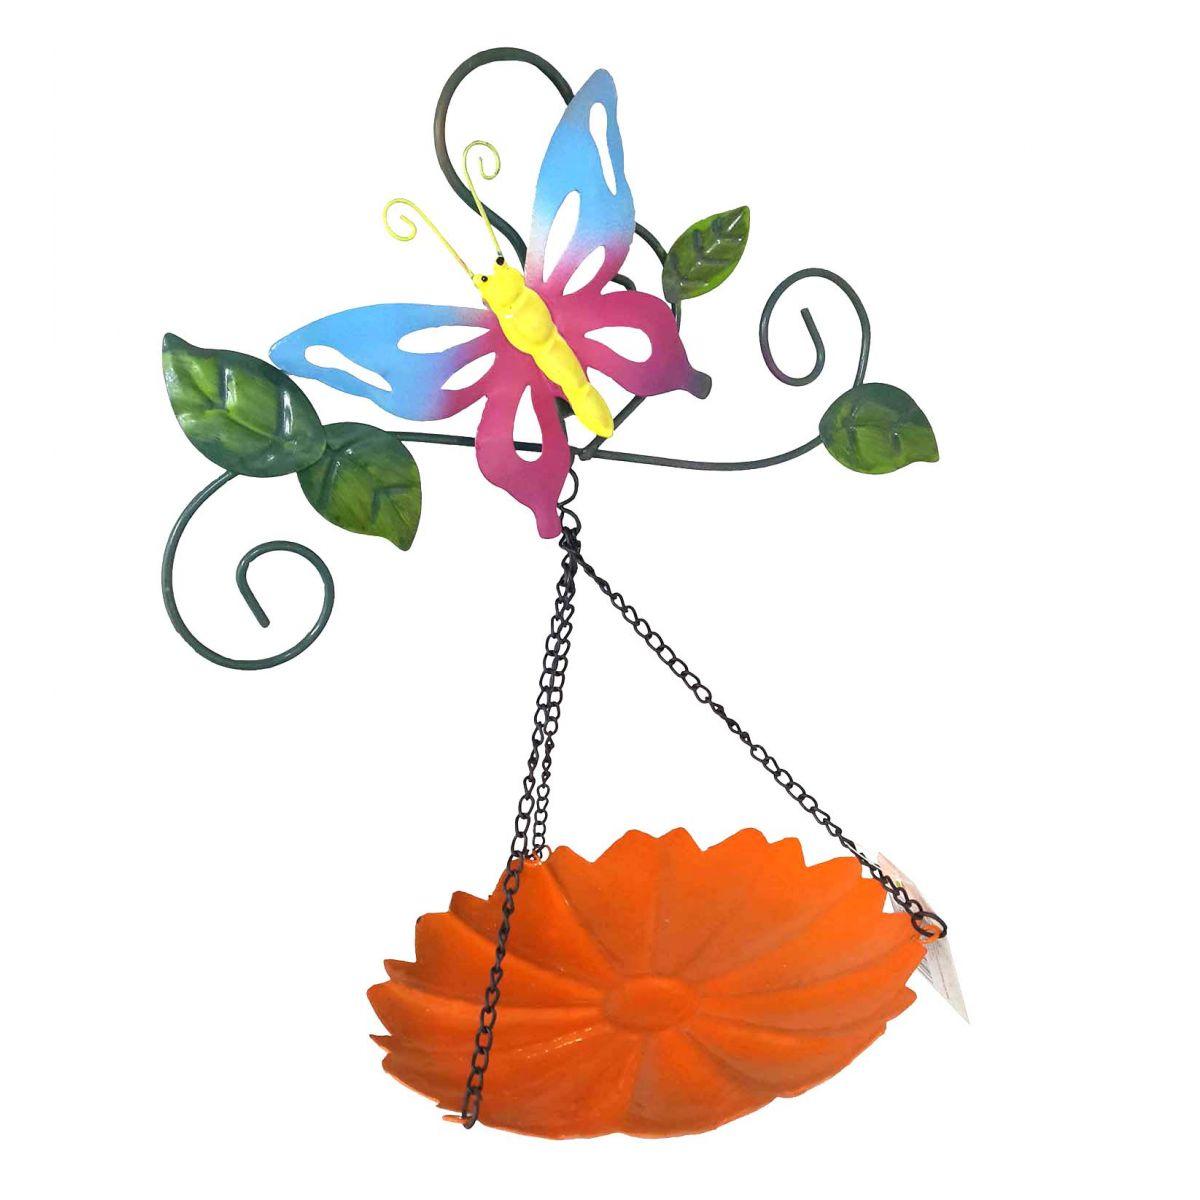 Enfeite Jardim Casa Quintal Flor Borboleta Para Pendurar Conjunto Com 3 Laranja (JARD-45)